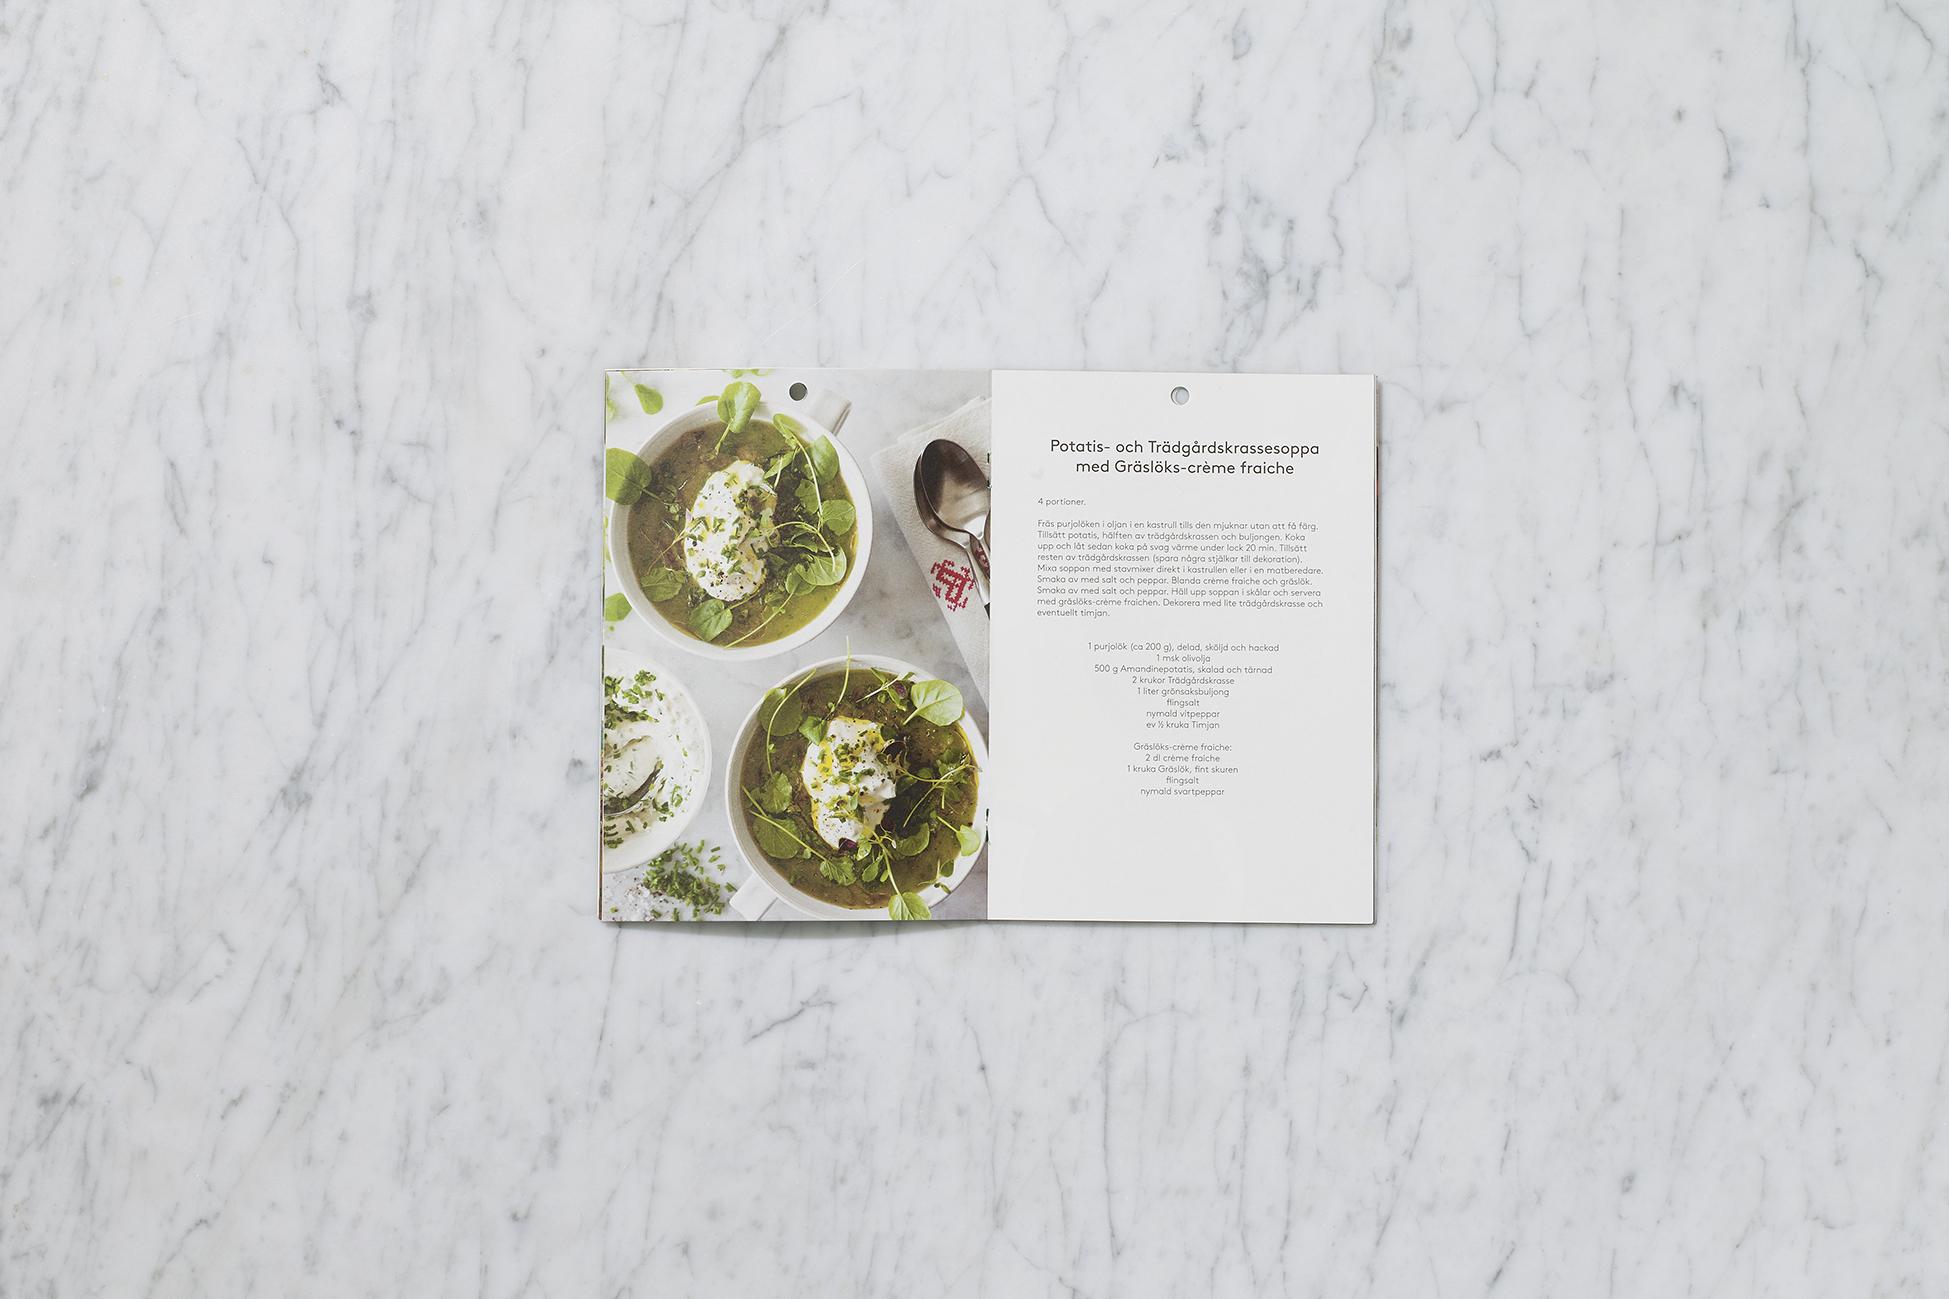 ÖPPET Graphic Design Brochure for Svegro